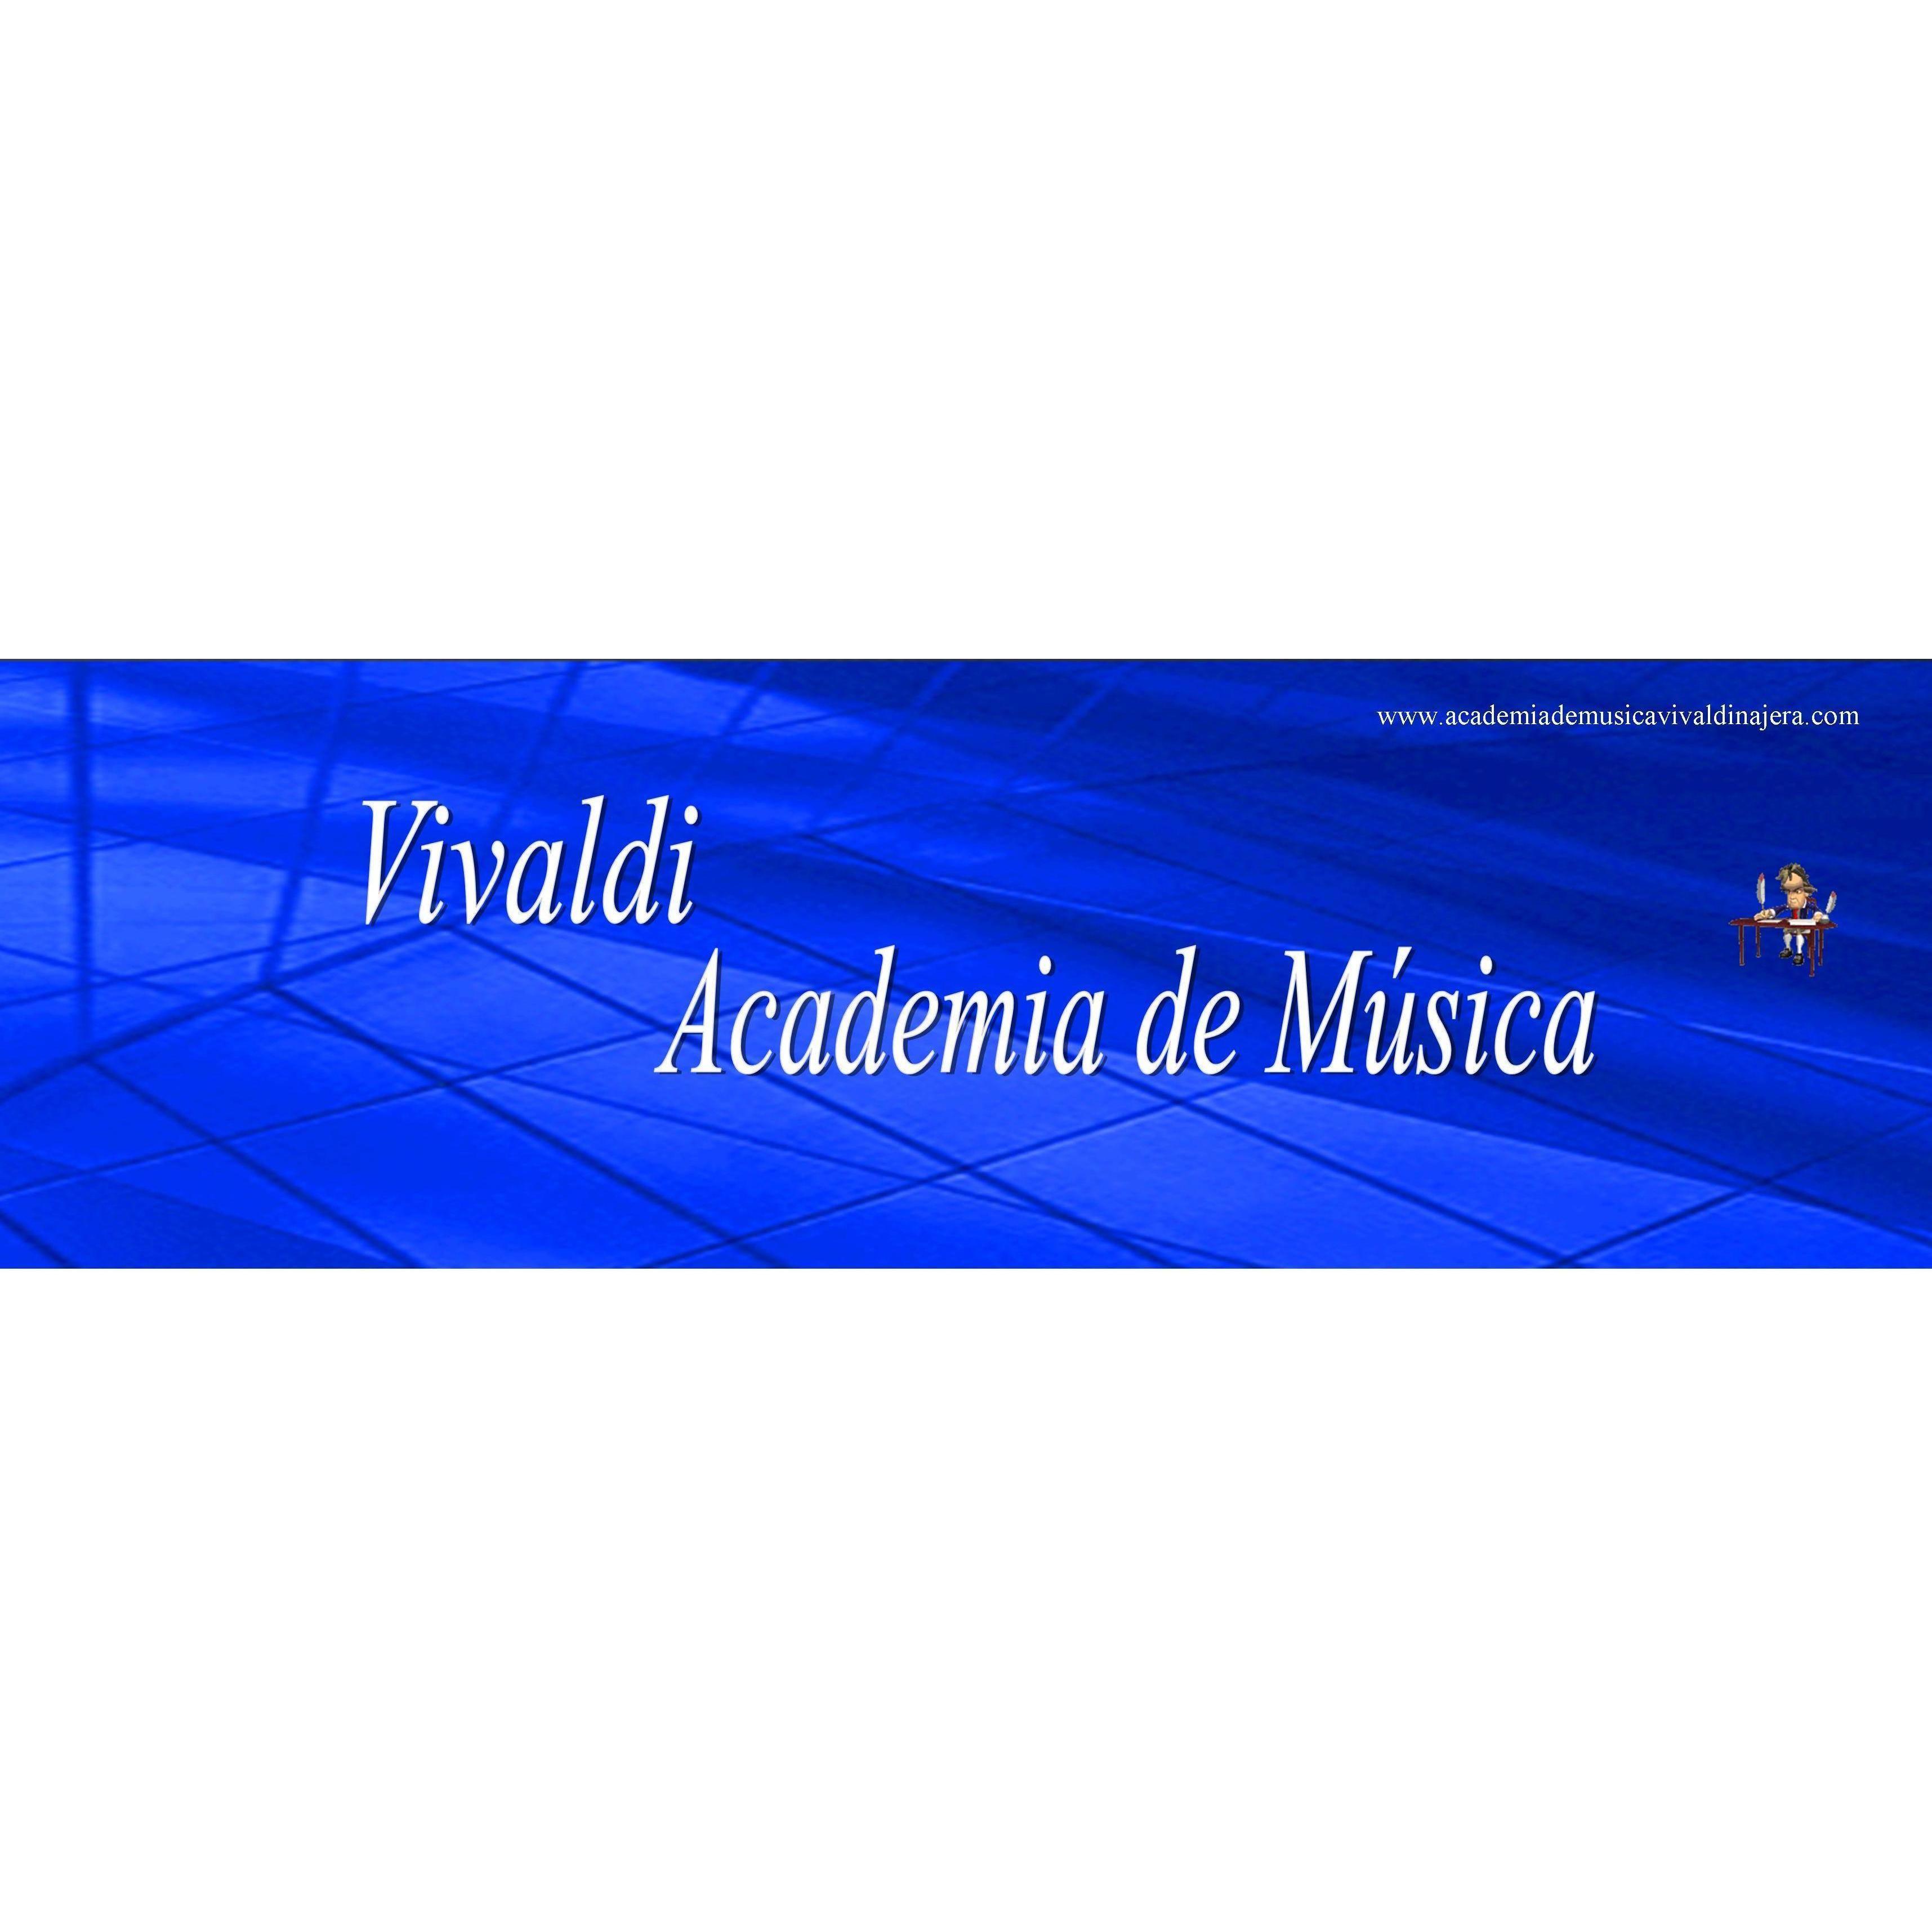 ACADEMIA DE MÚSICA VIVALDI